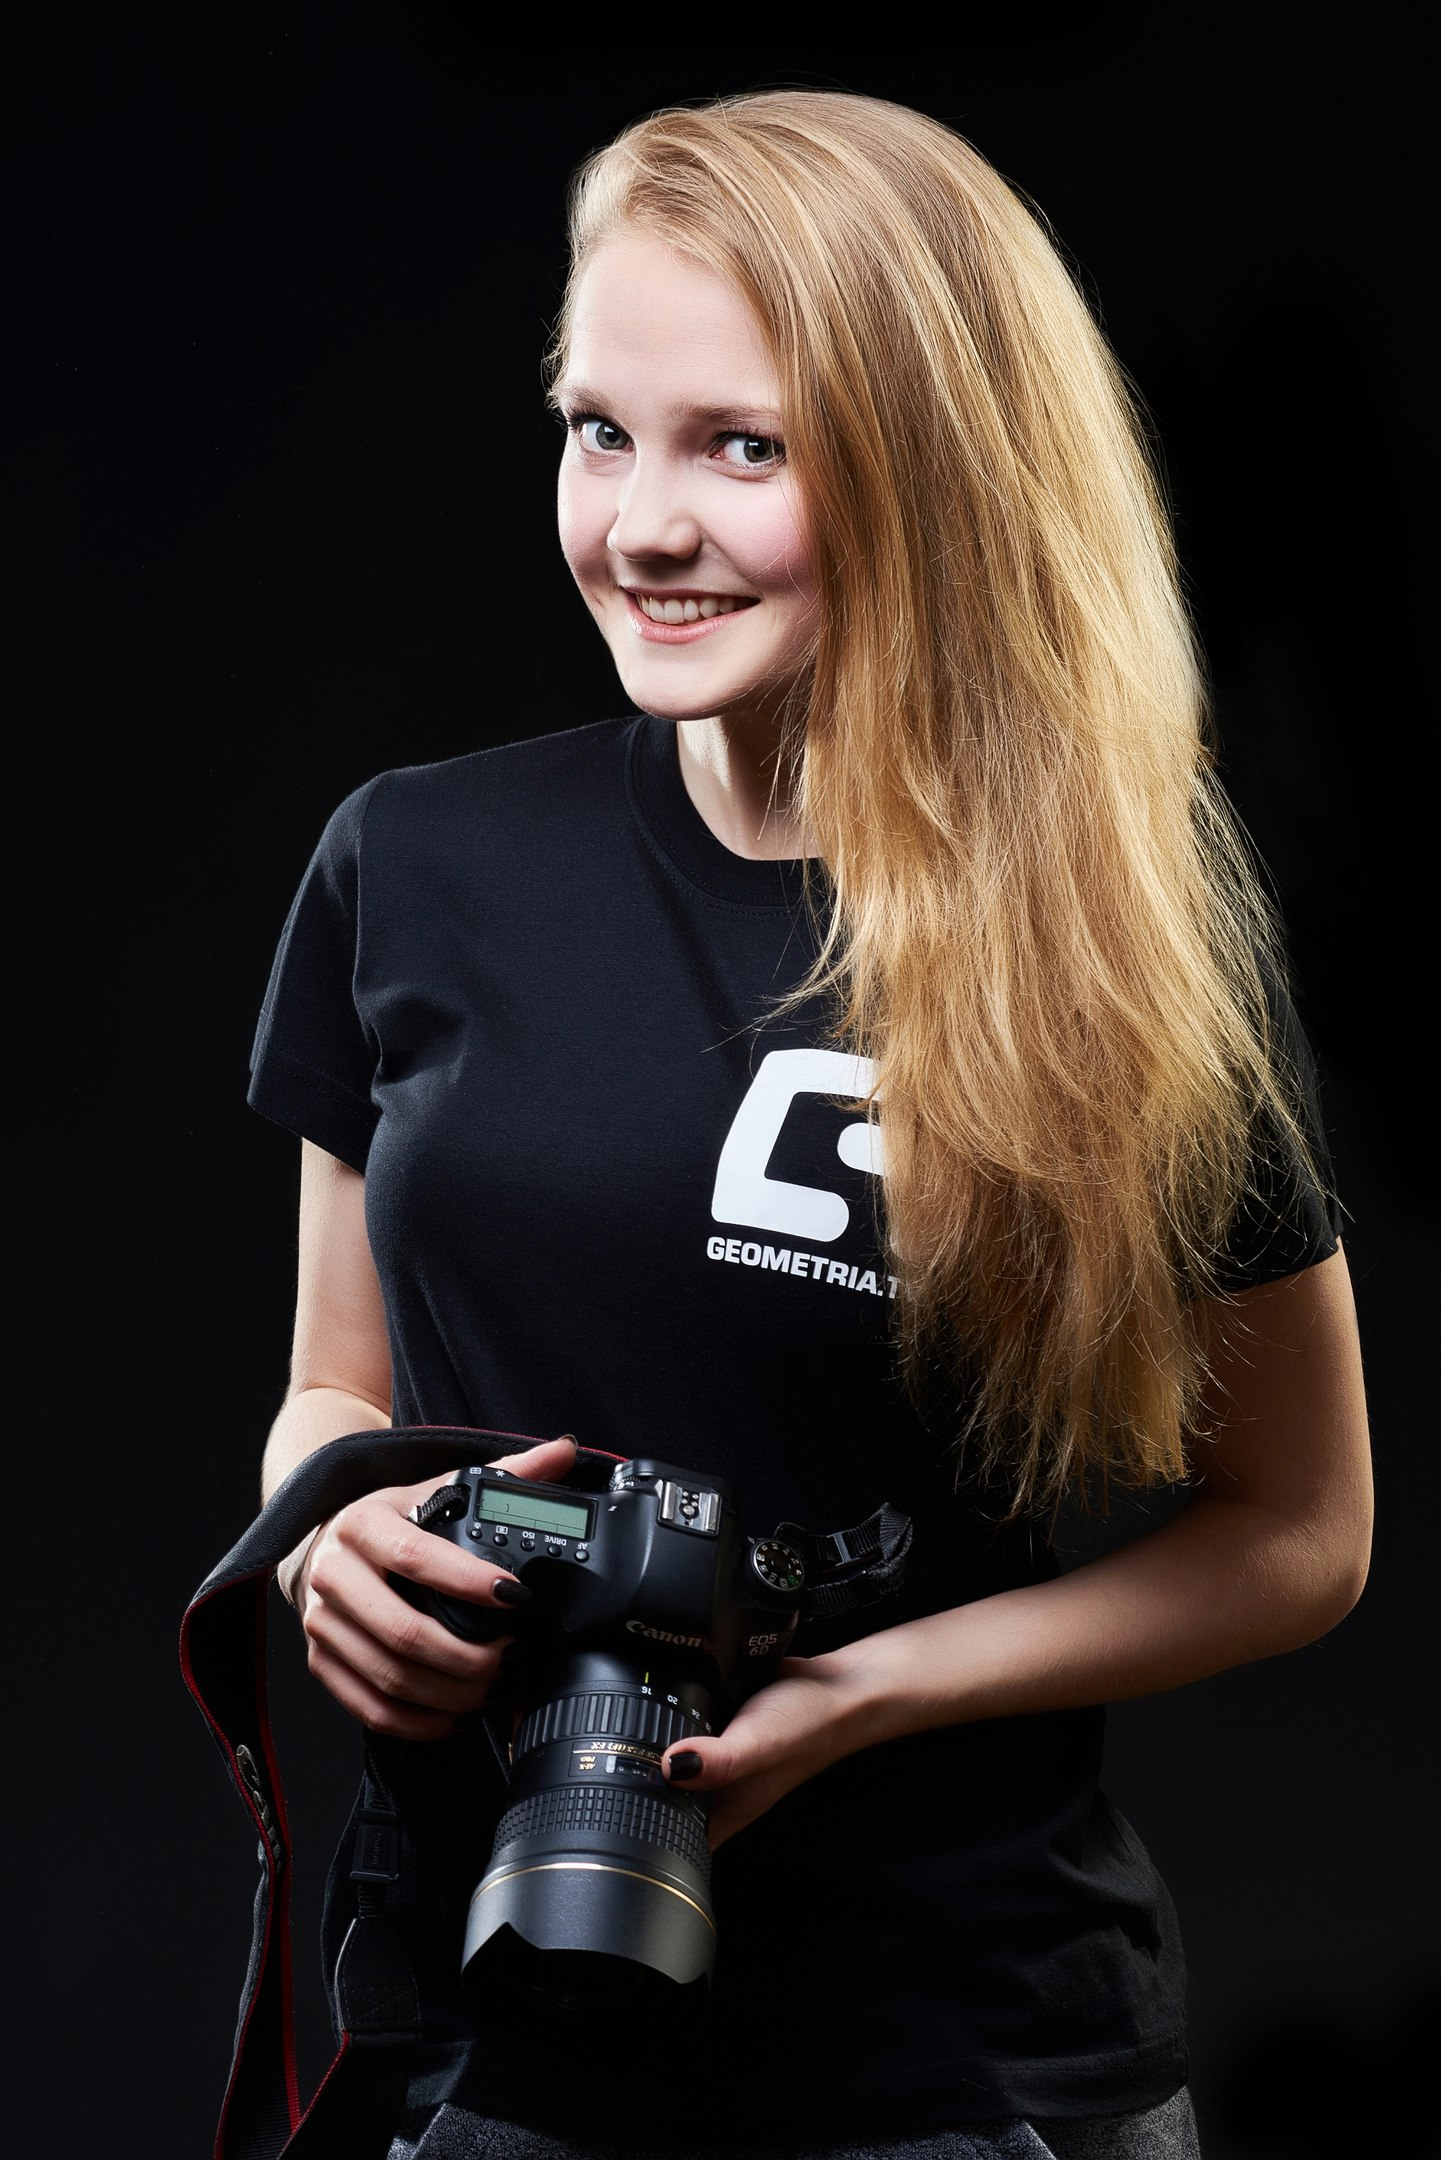 Elisaveta Korotkova